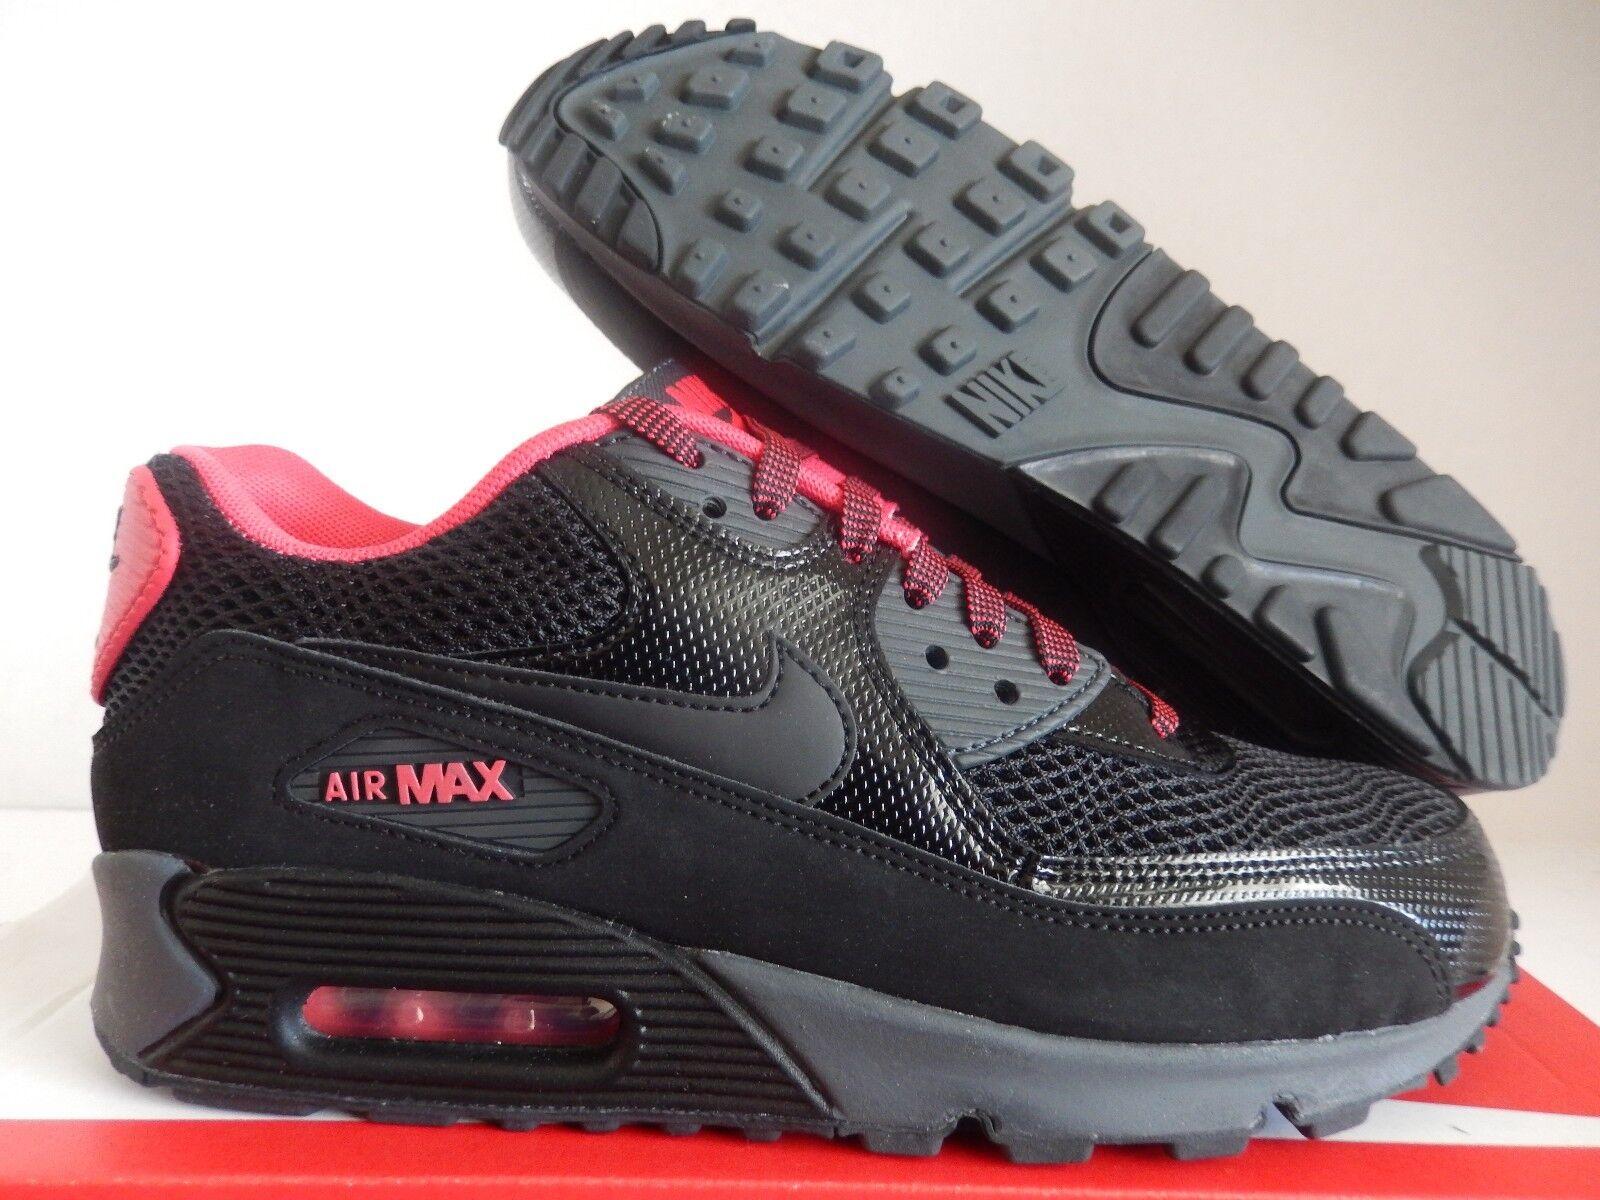 WMNS NIKE AIR MAX 90 BLACK-BLACK-FUSION RED-ANTHRACITE SZ 7.5 [325213-026]